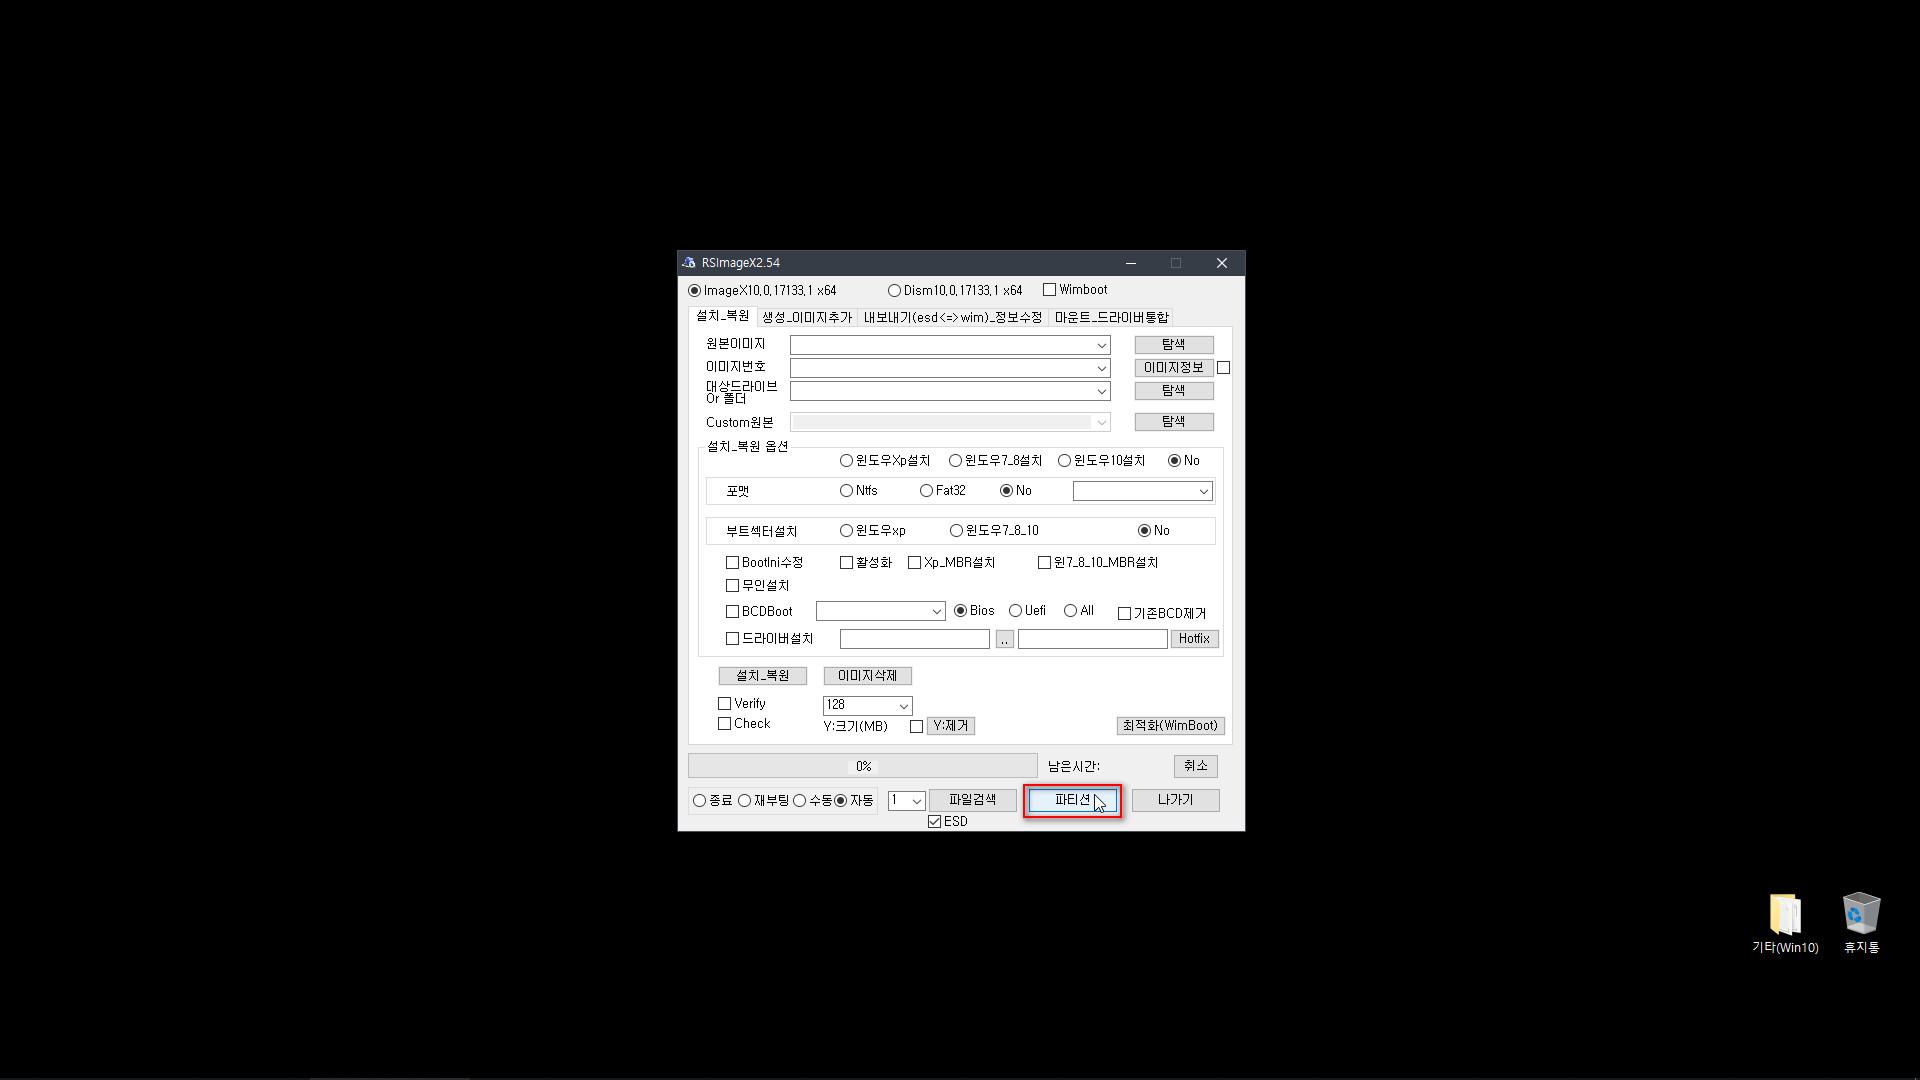 4. RSImageX 실행 - 파티션 클릭.jpg